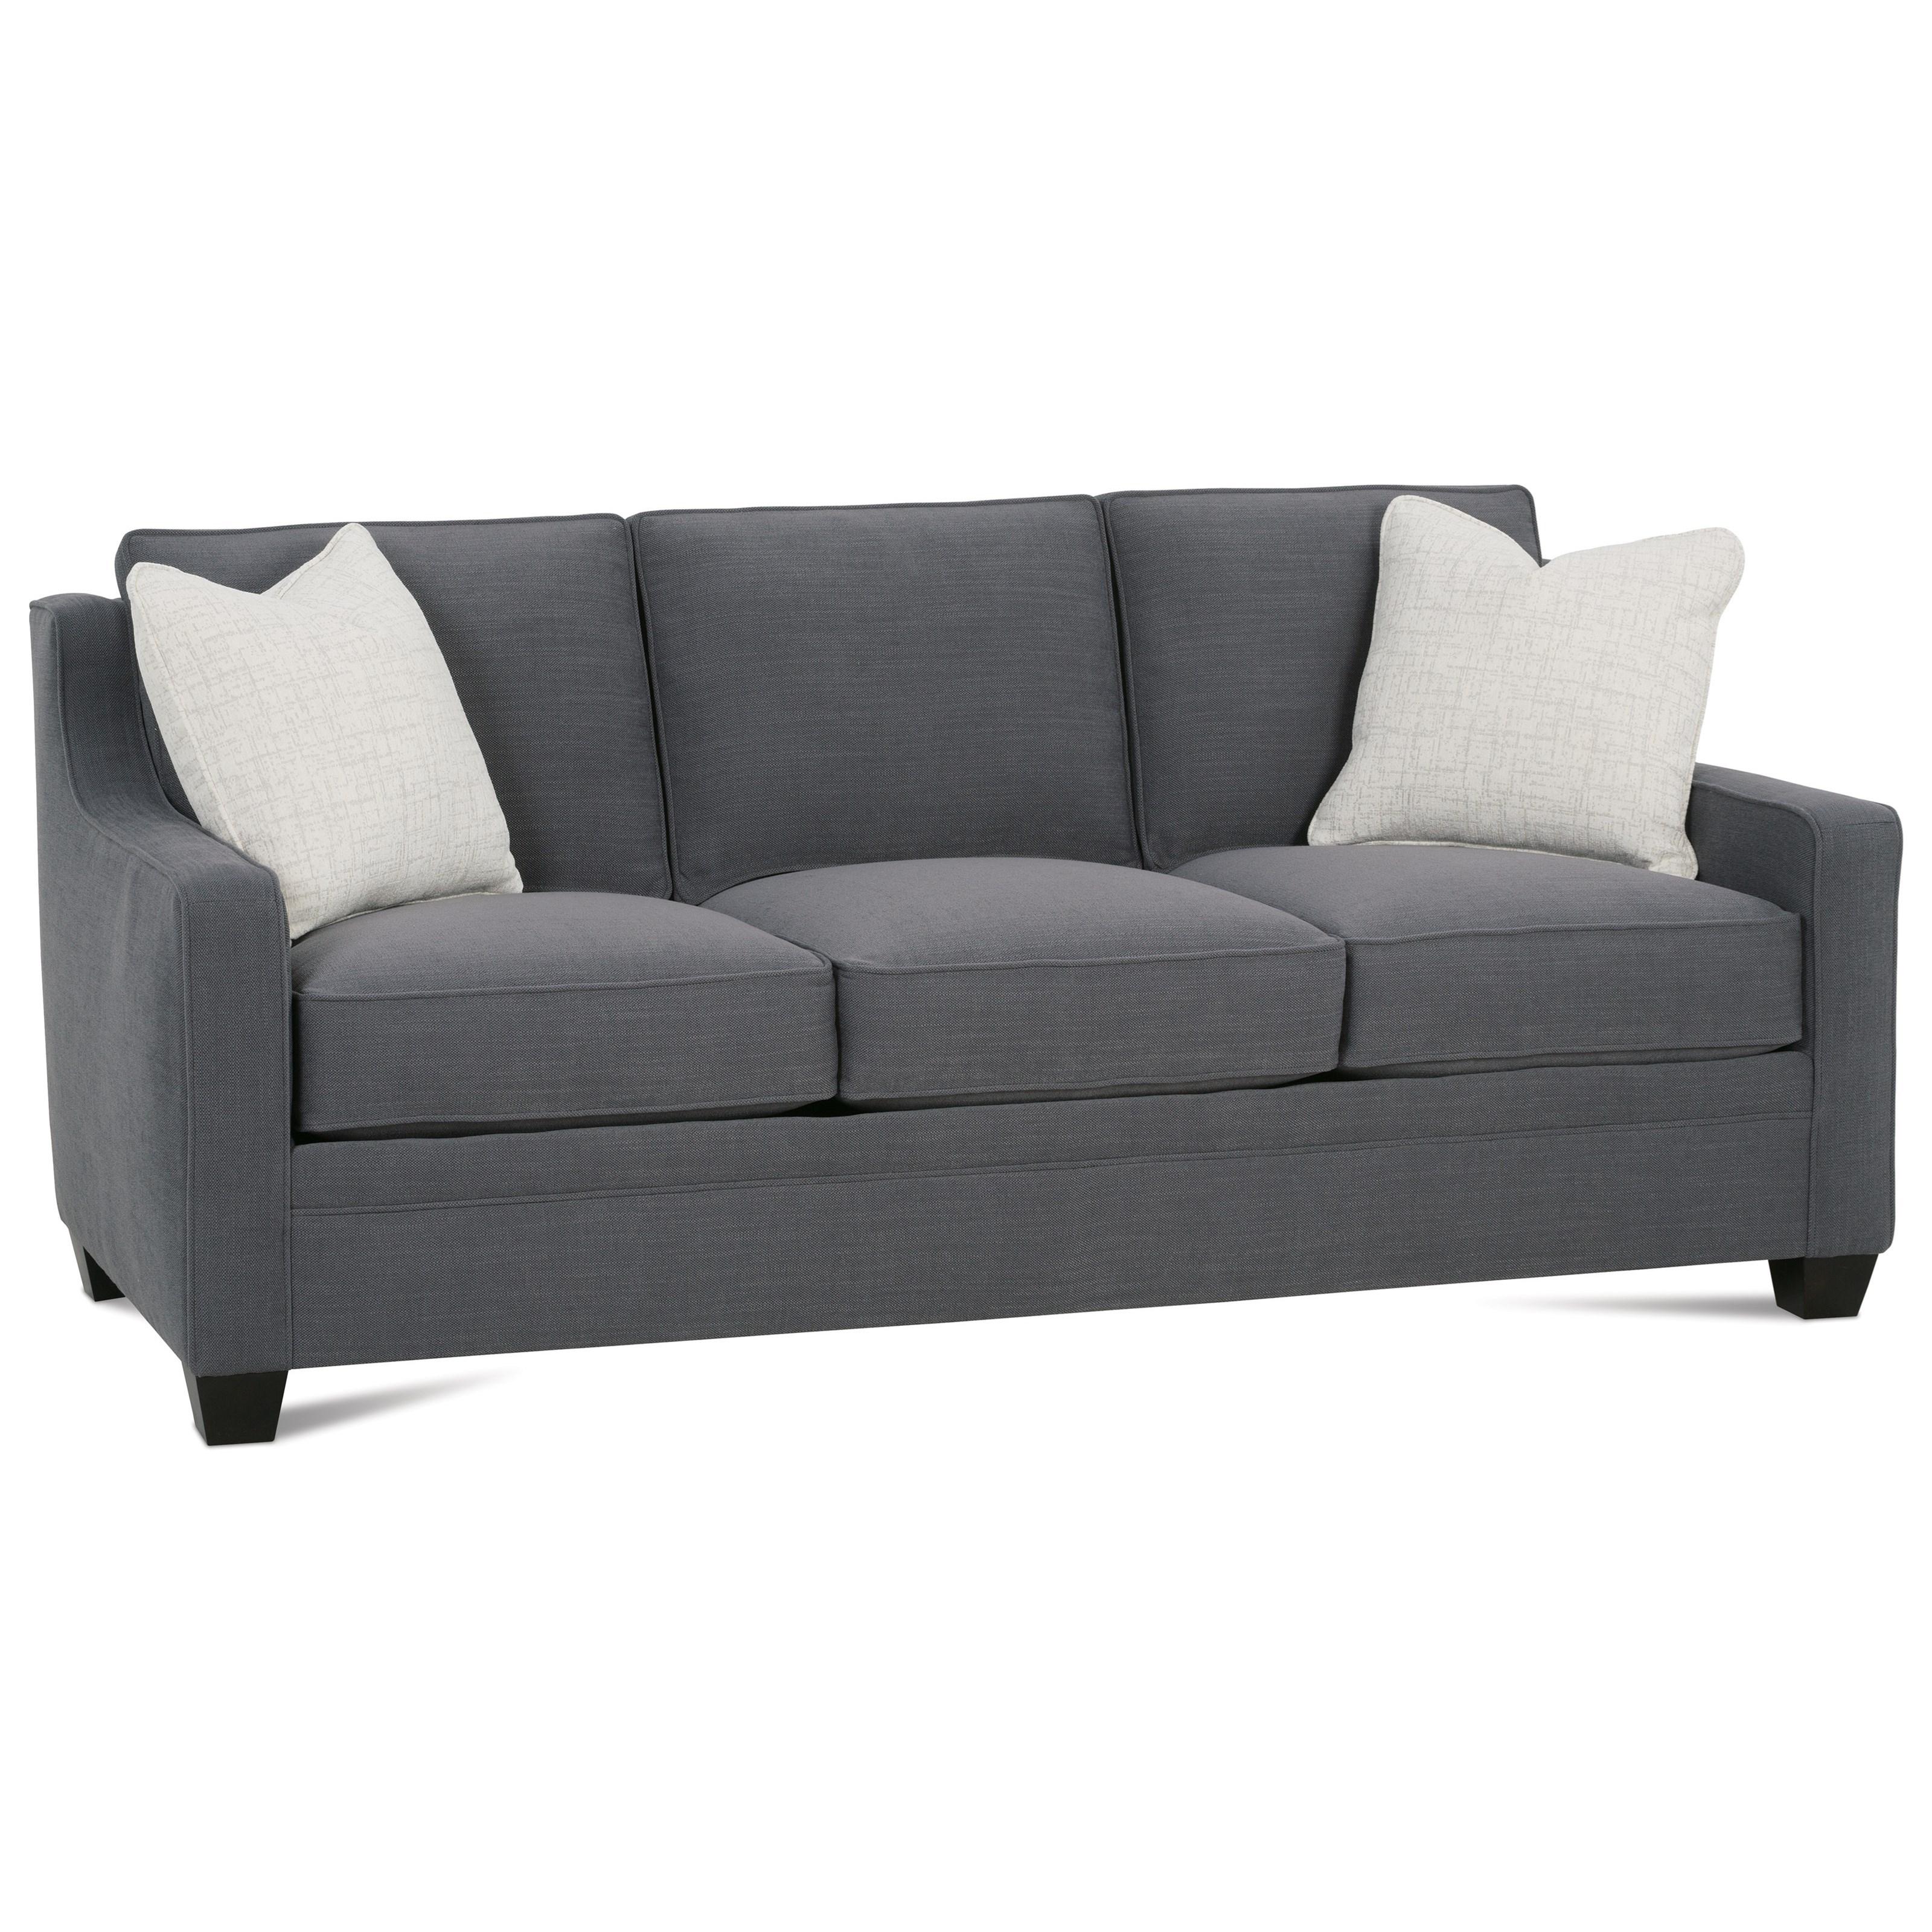 Fuller Full Bed Sleeper Sofa by Rowe at Baer's Furniture